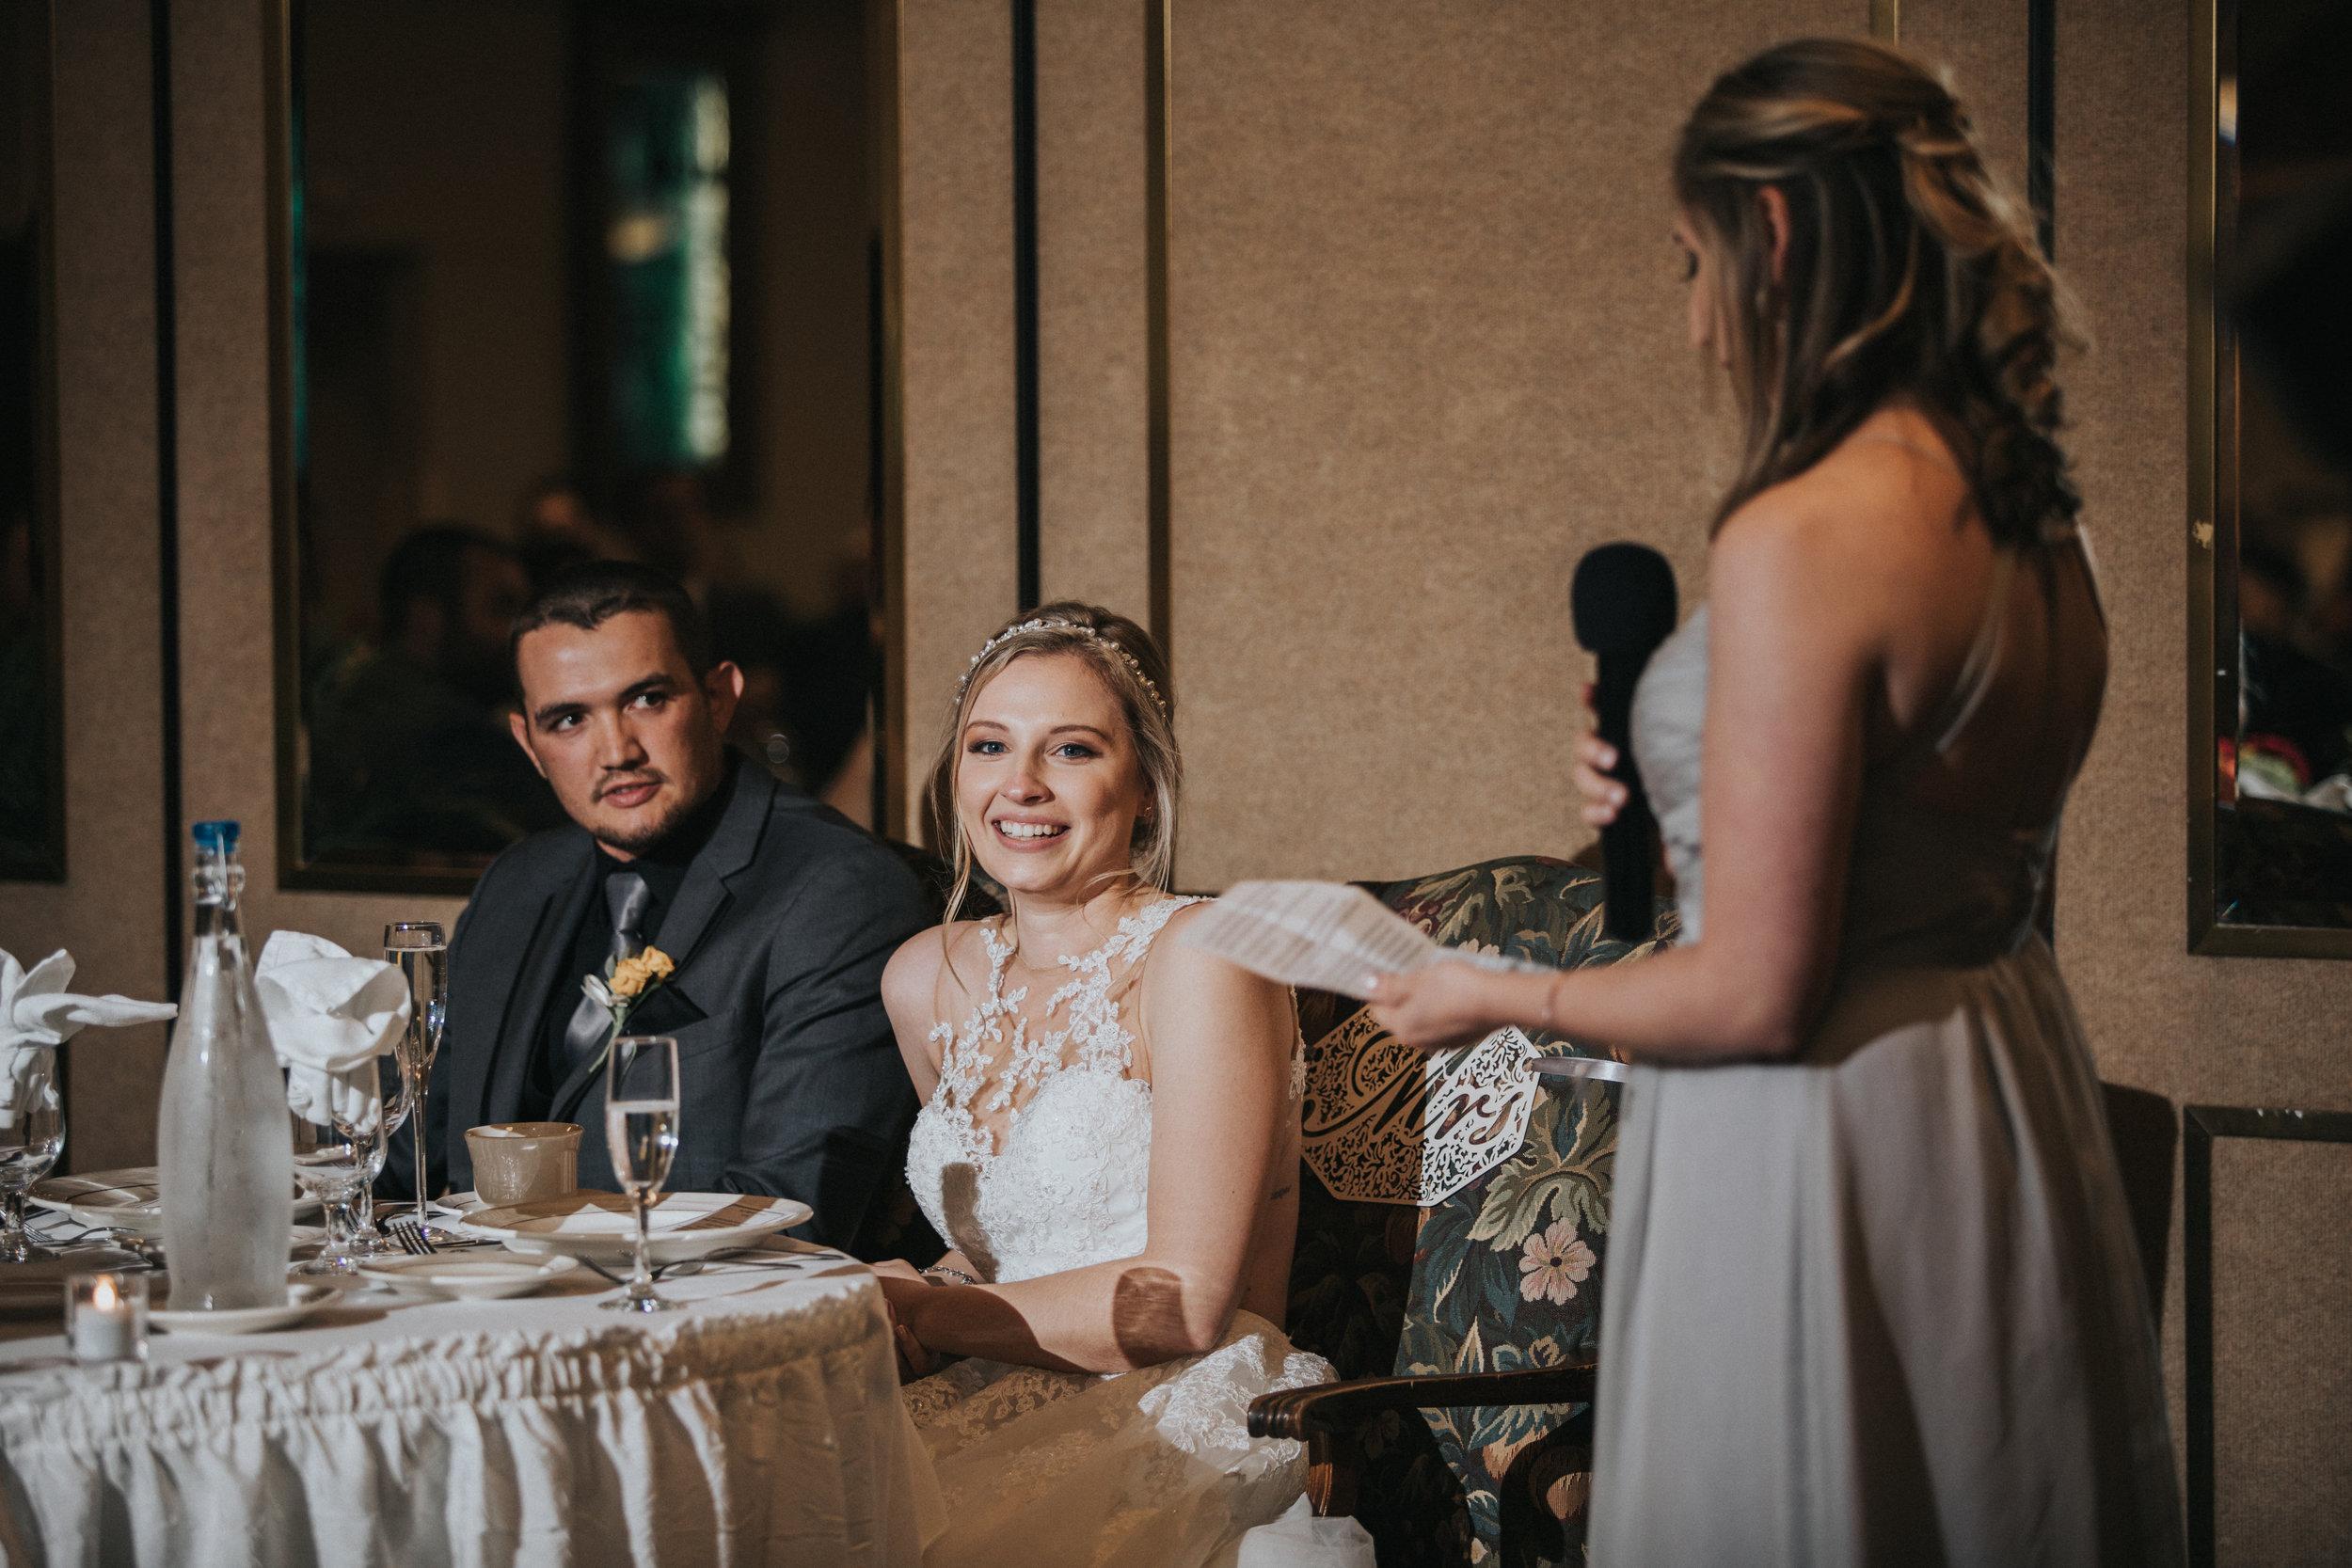 New-Jersey-Wedding-Photographer-Megan&Nick-Reception-84.jpg